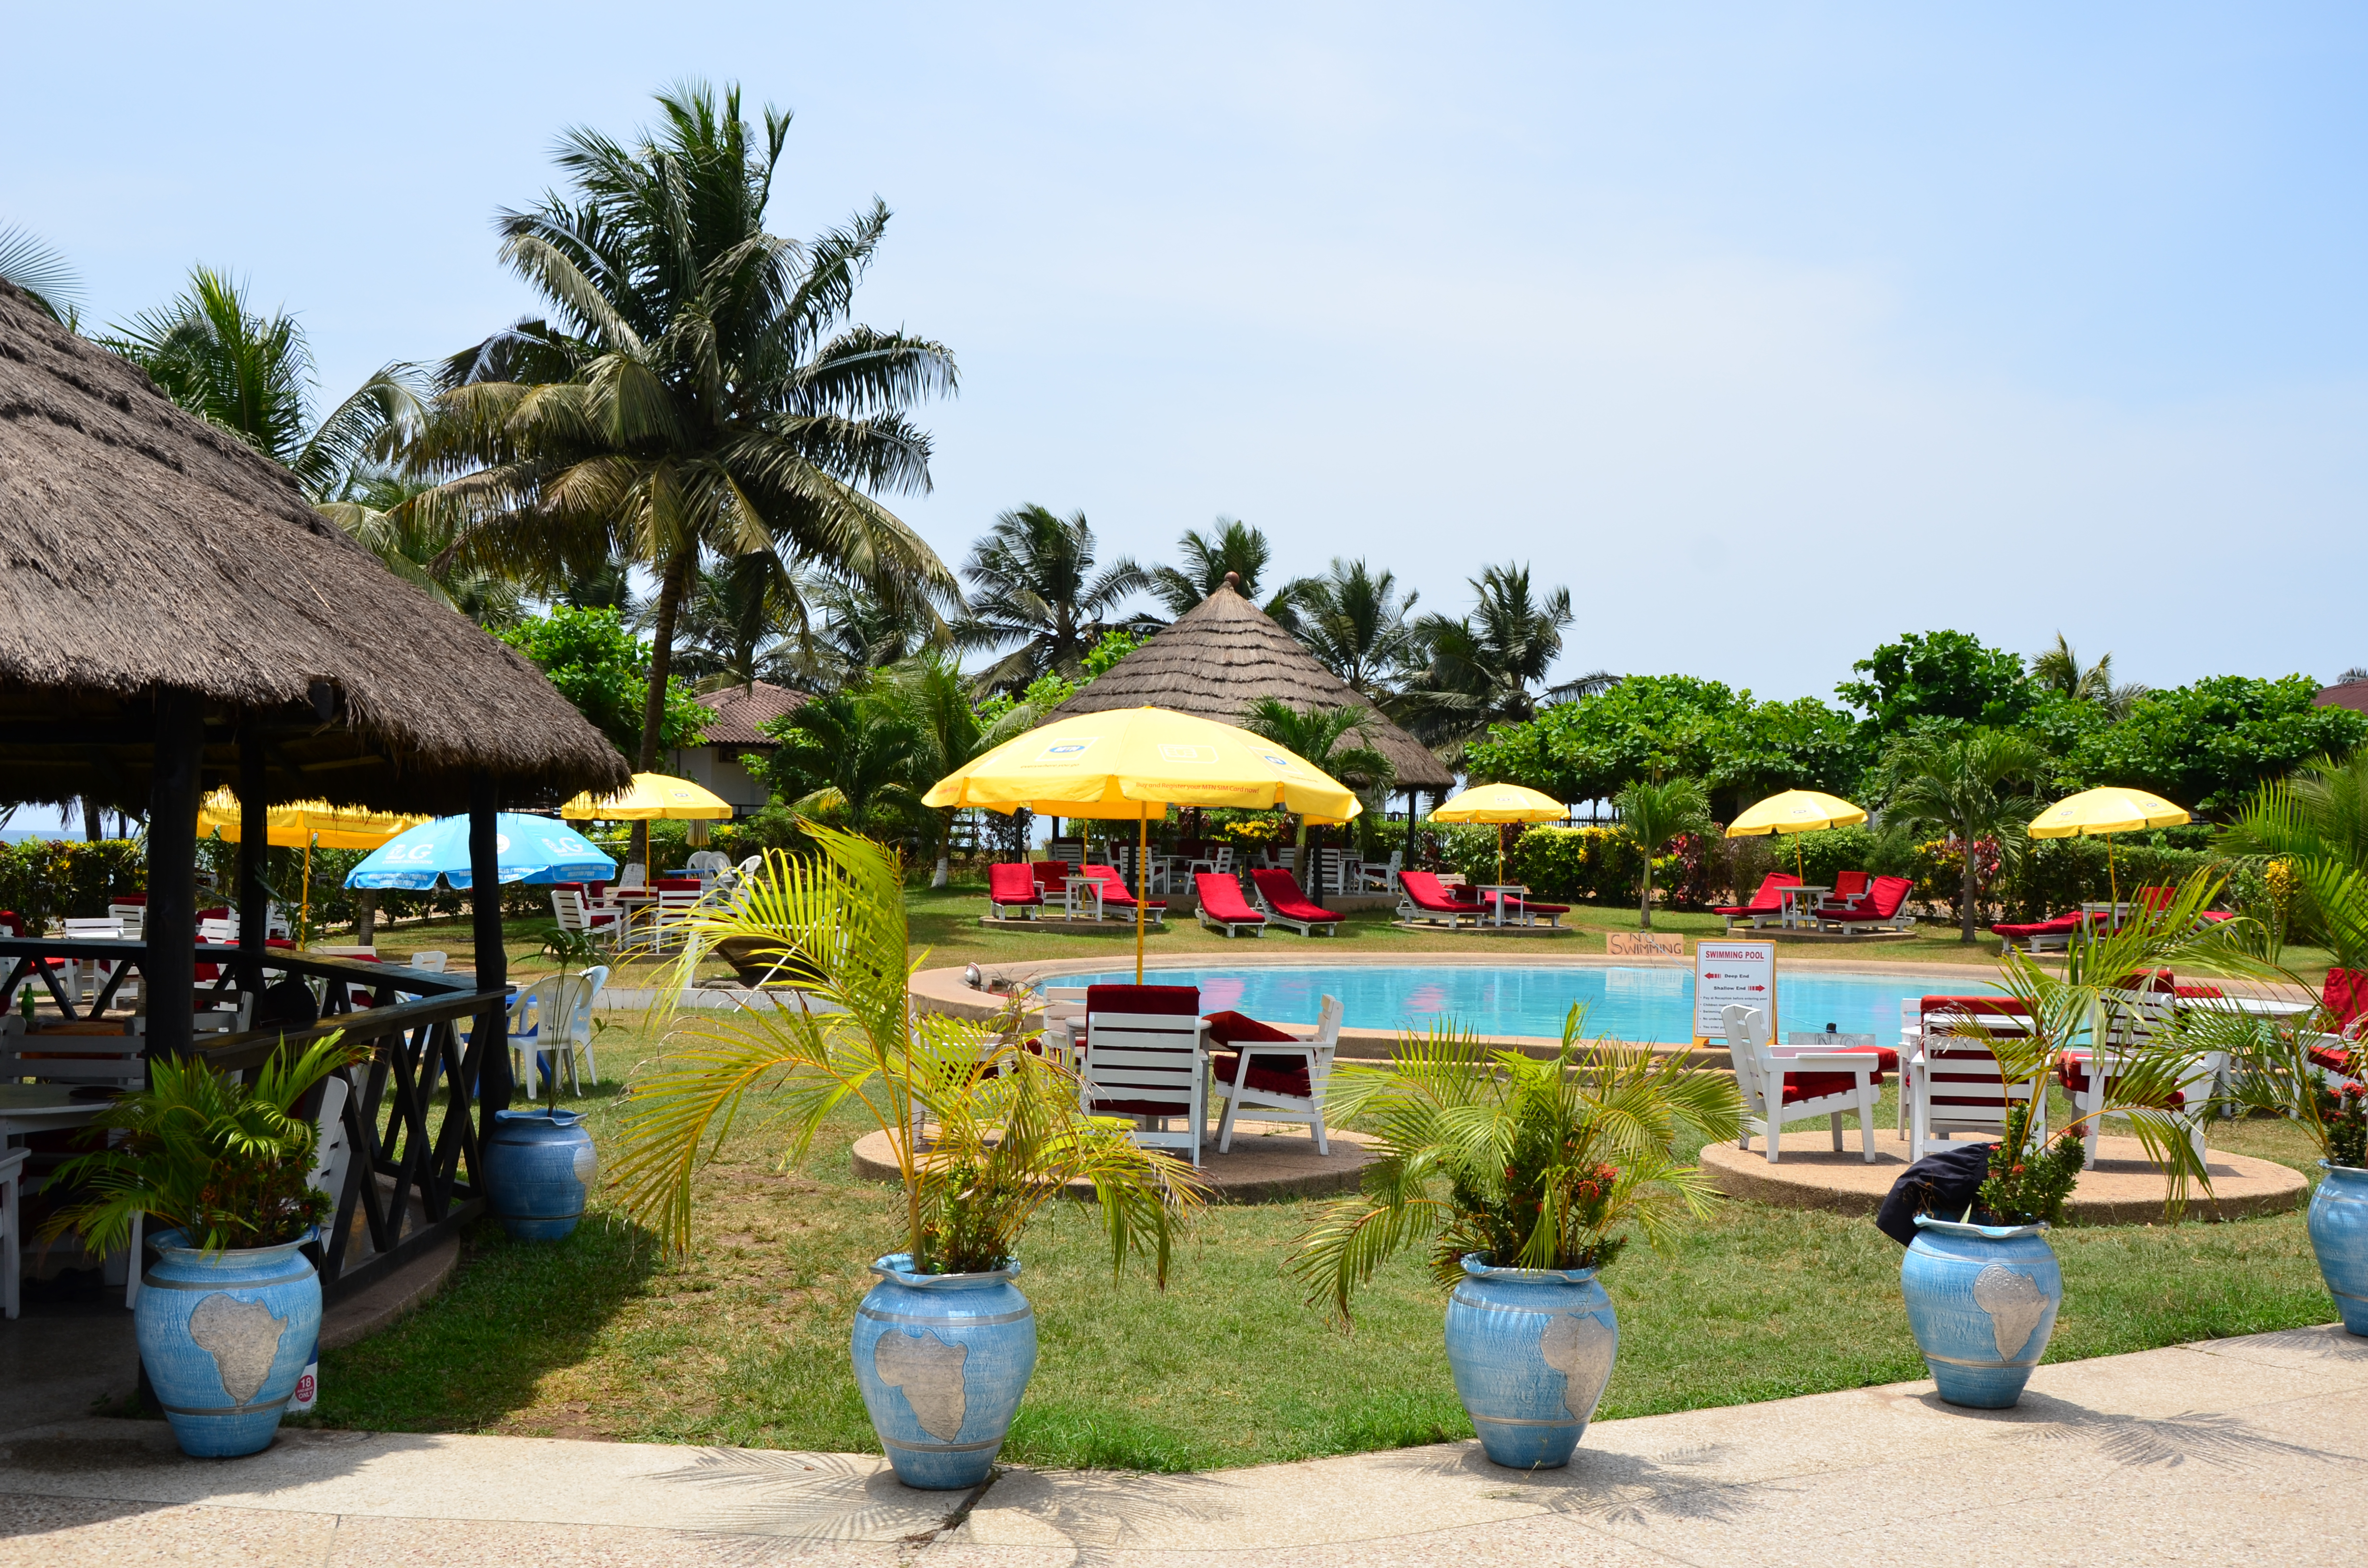 Africa Beach Hotel Takoradi